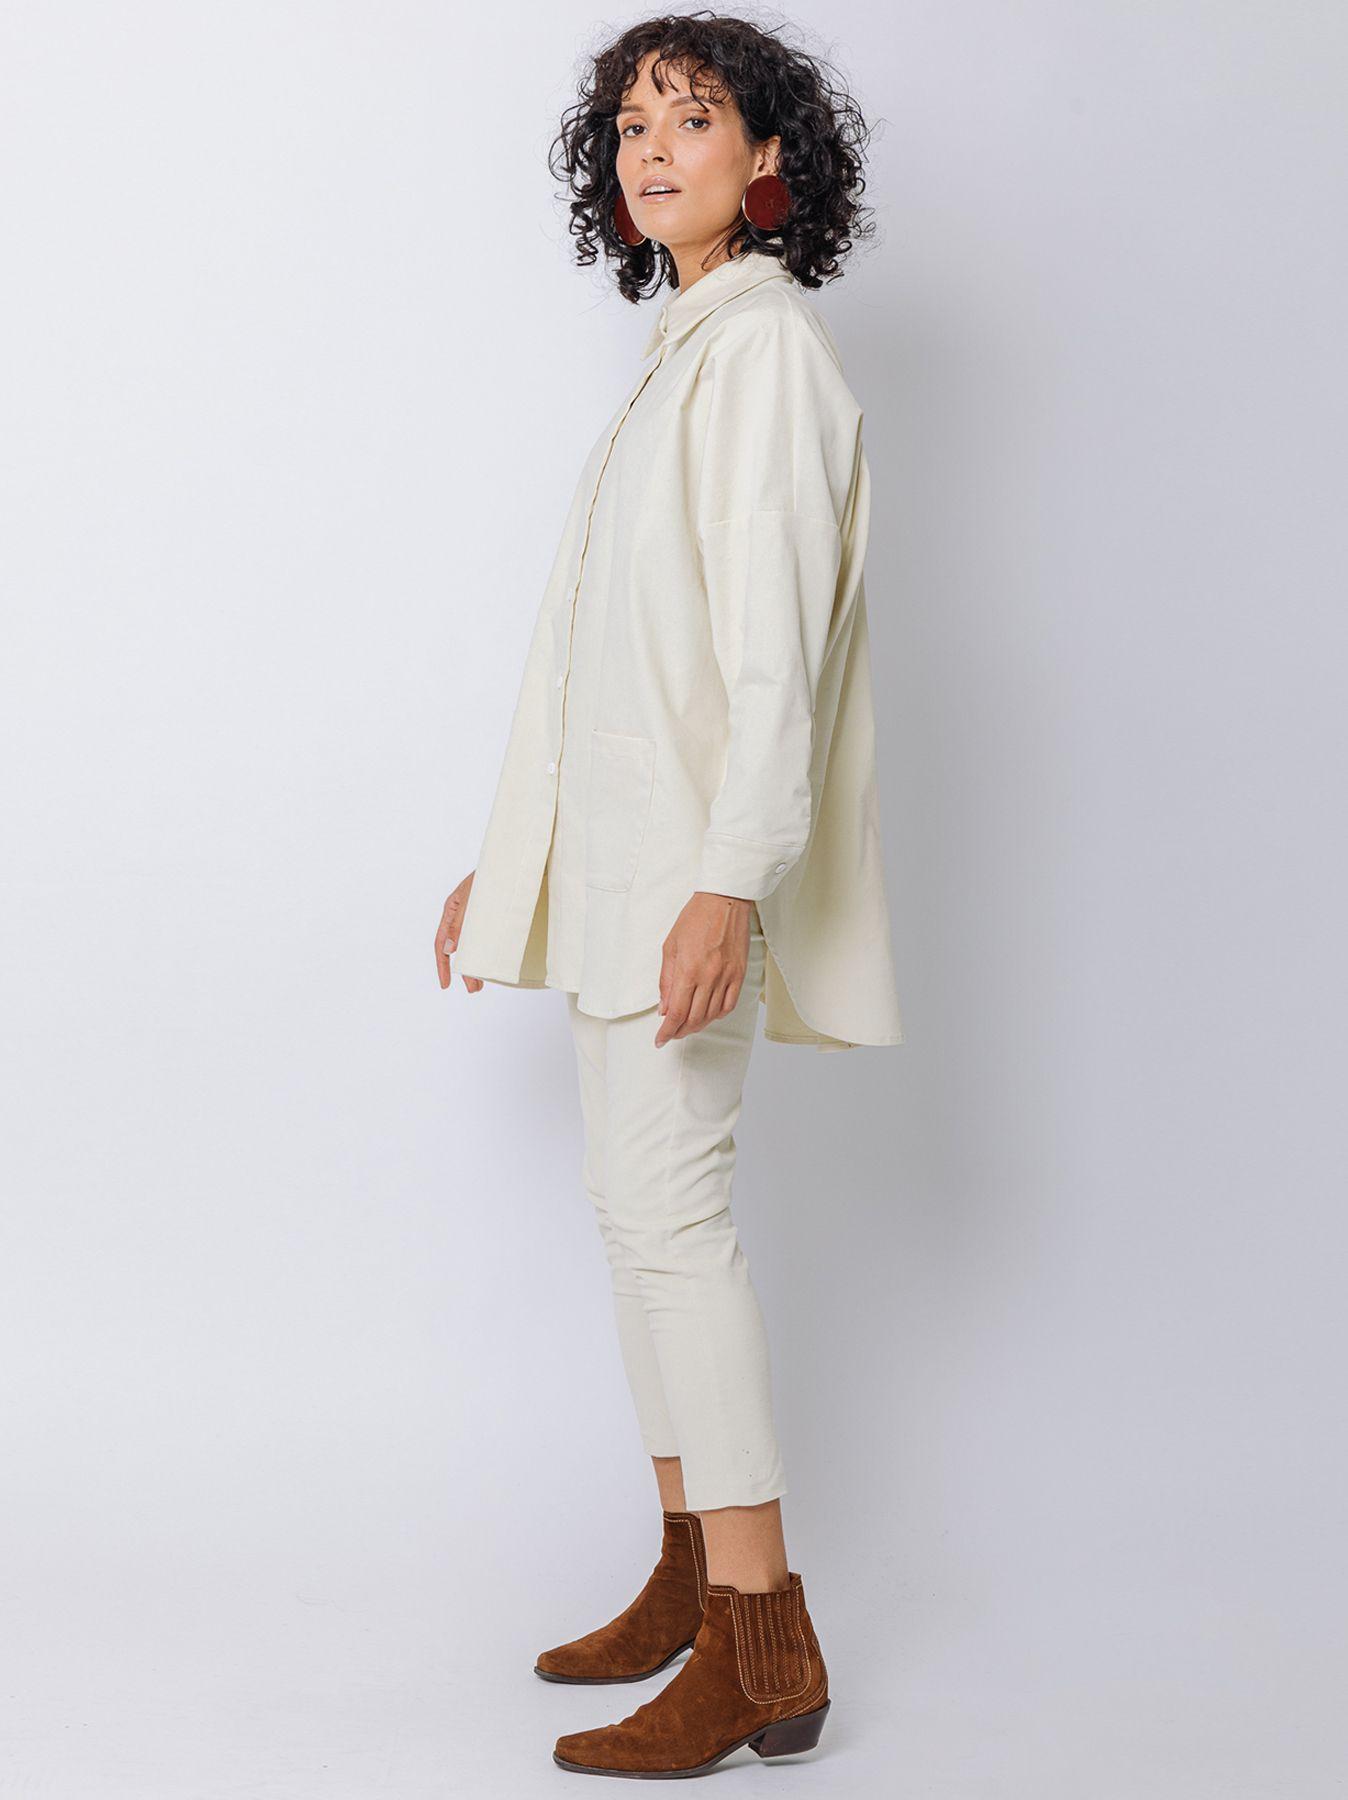 Giacca camicia in velluto millerighe